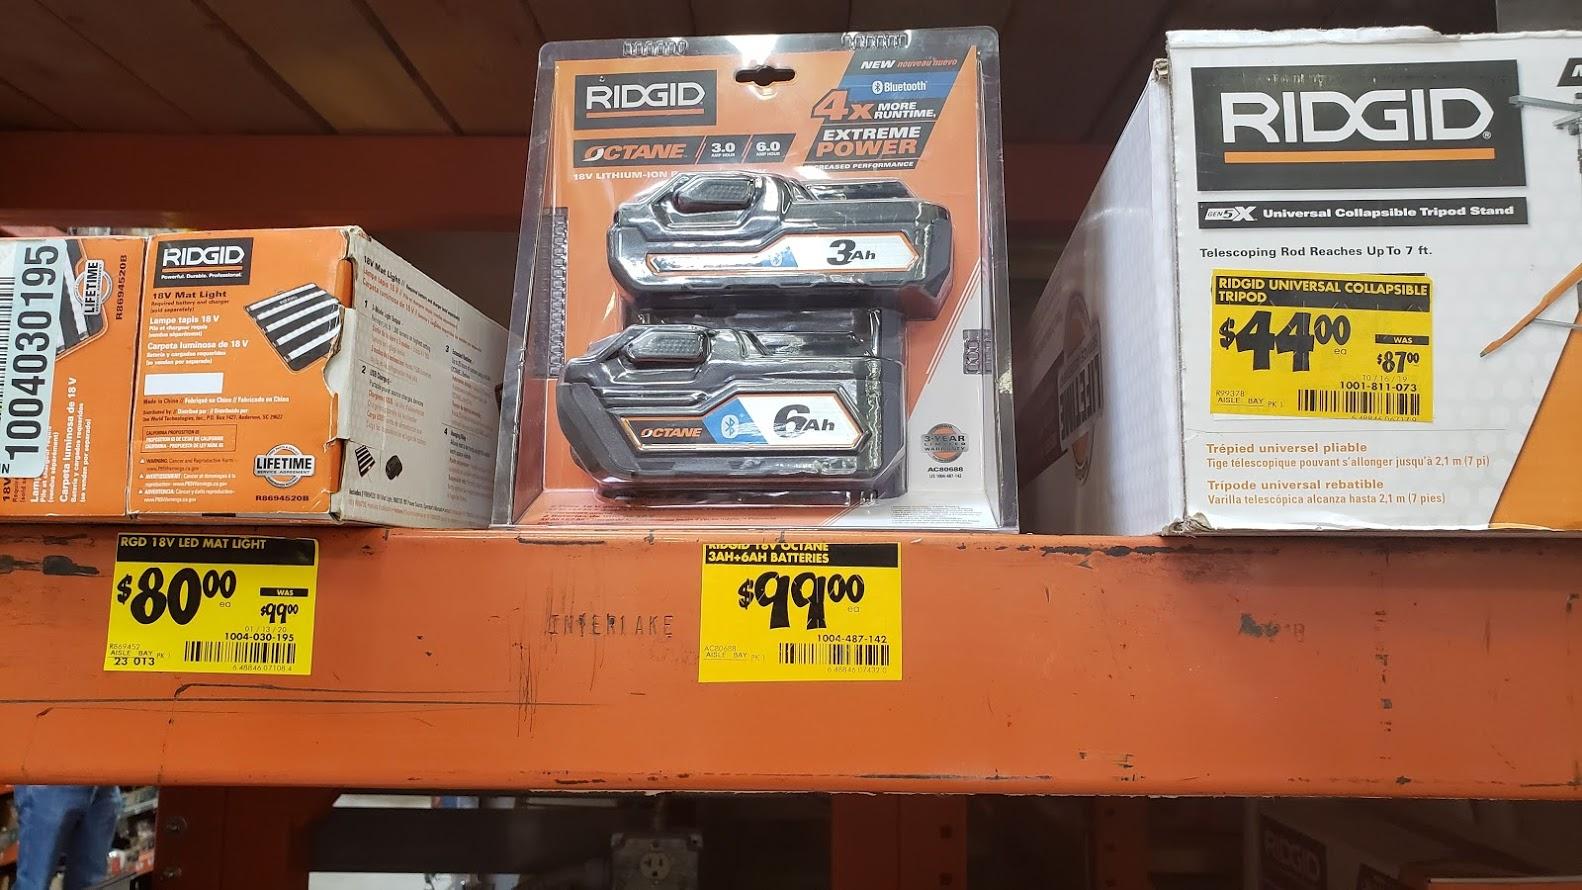 Ridgid Octane 3 Ah + 6 Ah battery combo, Home Depot, $99, Extreme YMMV